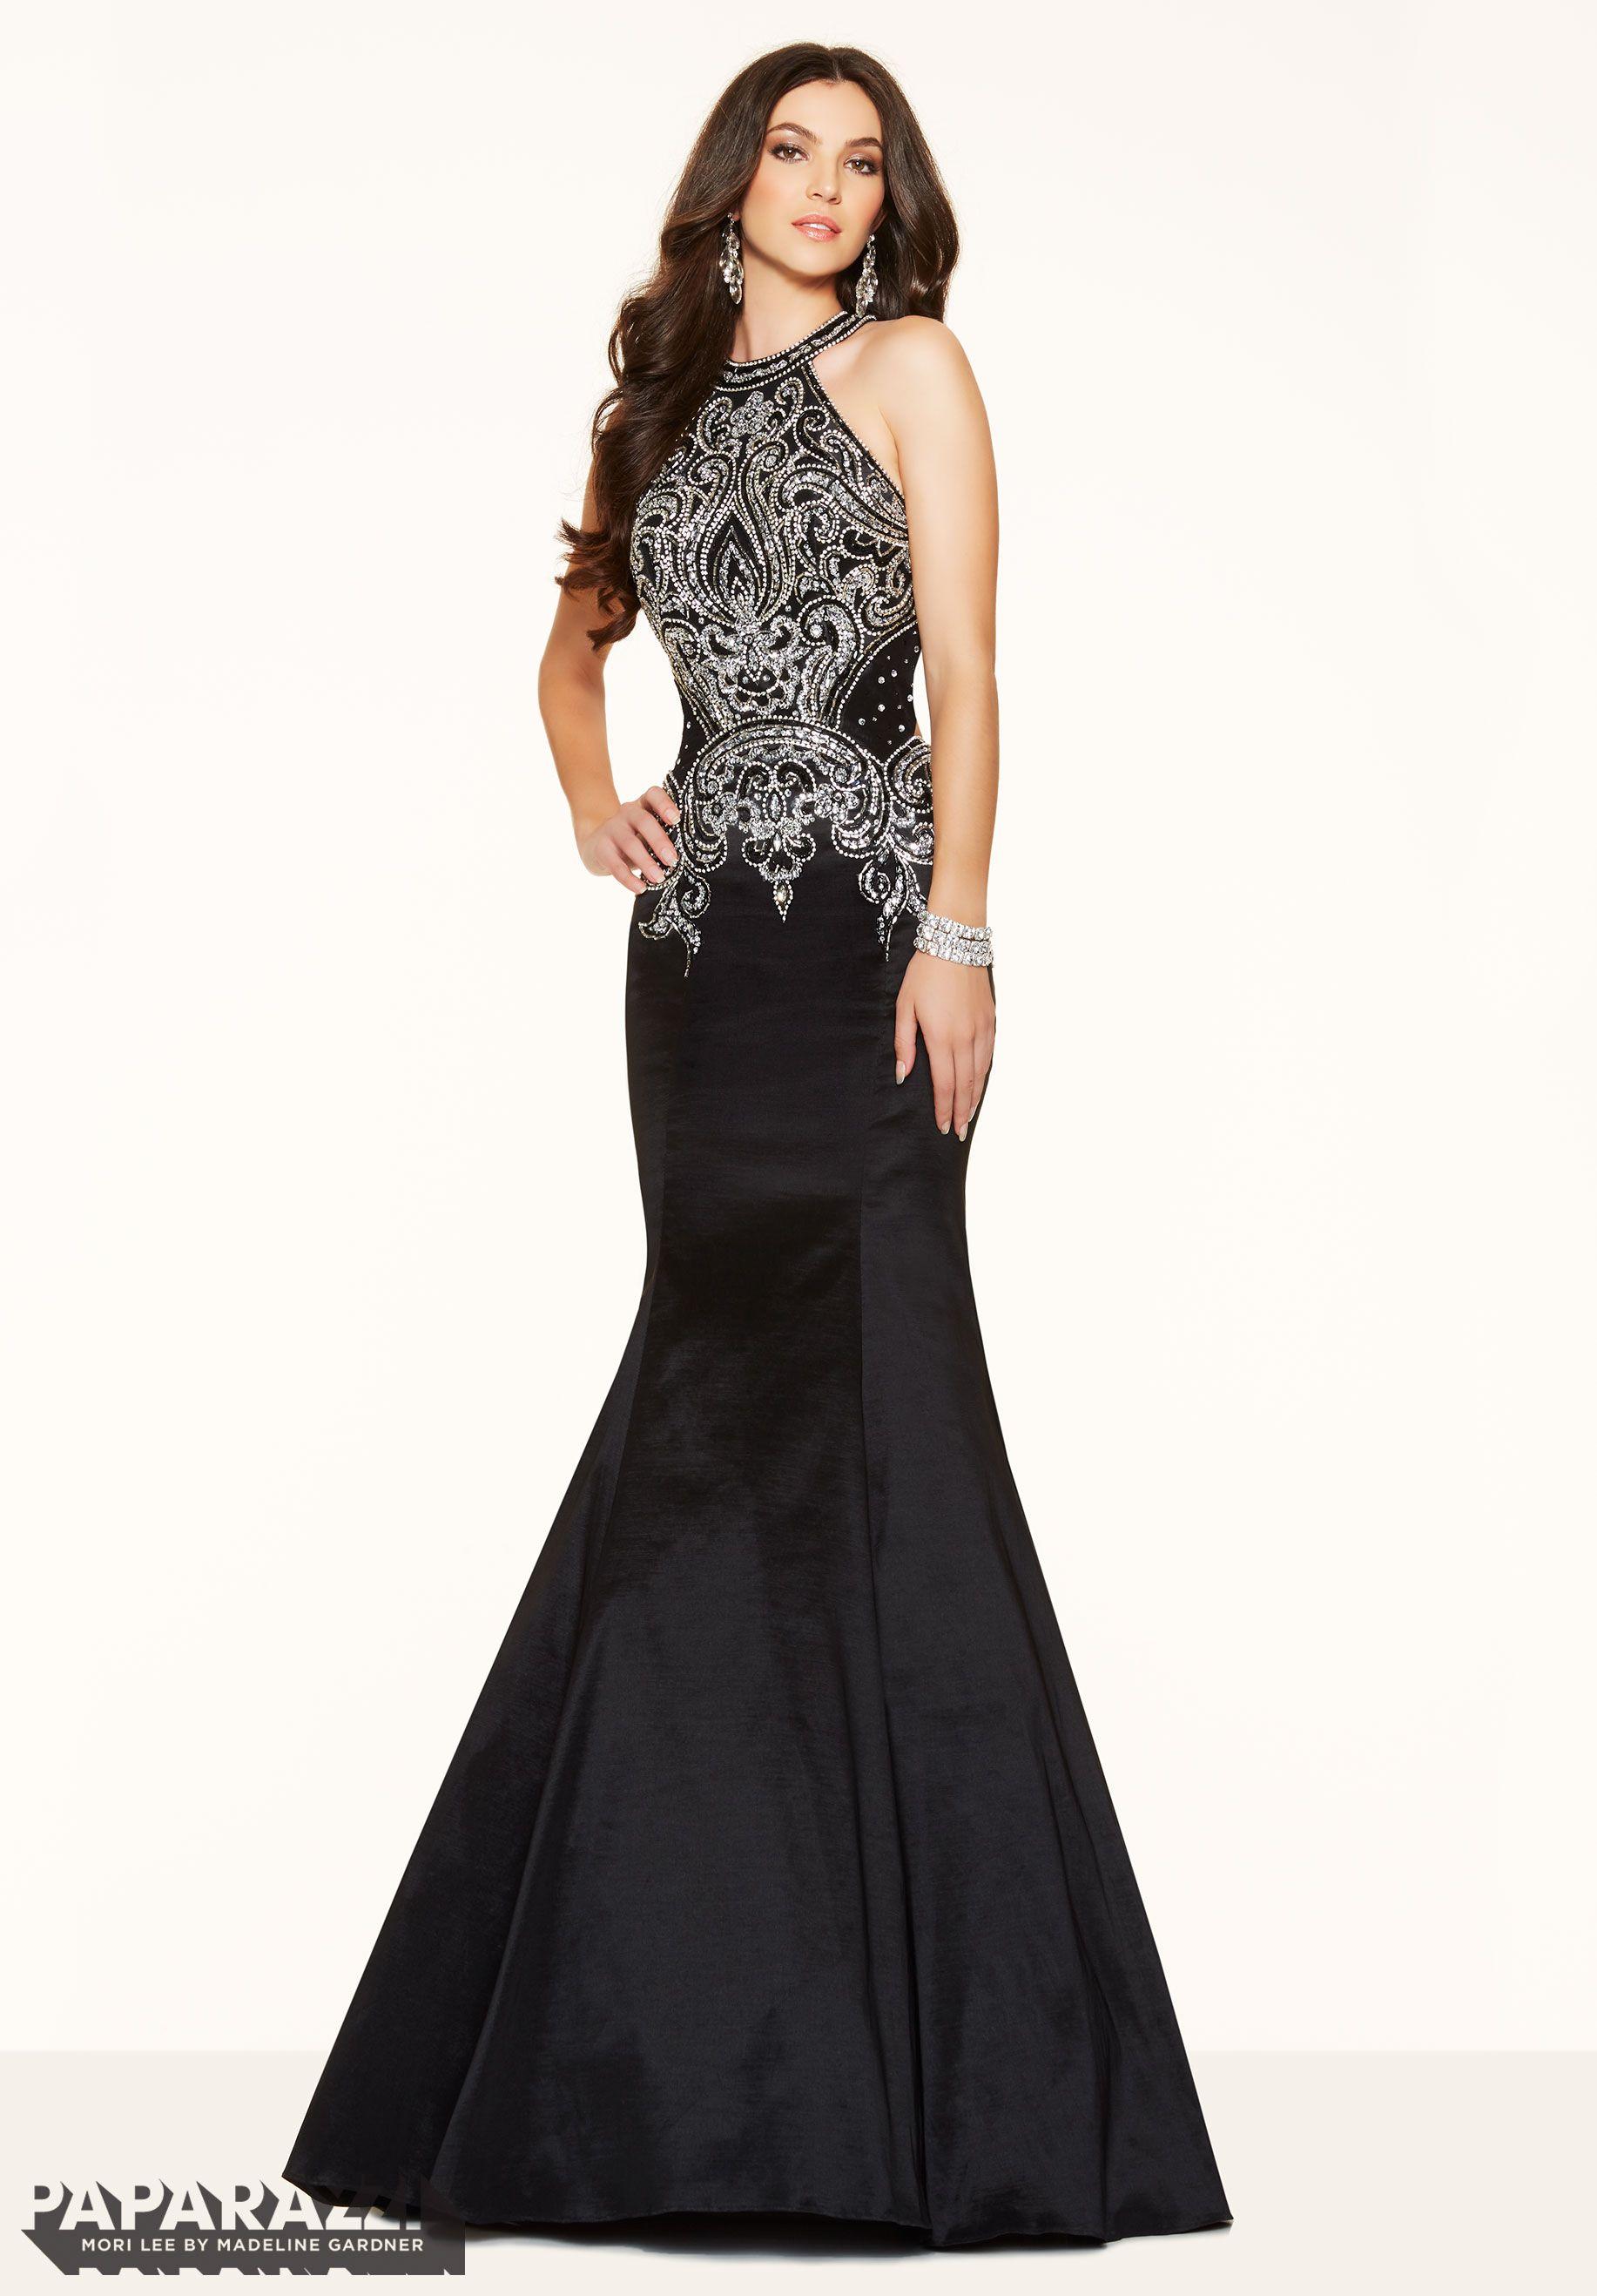 Prom dresses by Paparazzi Prom Beaded Stretch Taffeta Zipper Back Closure.  Colors Available  Navy e21c88a516